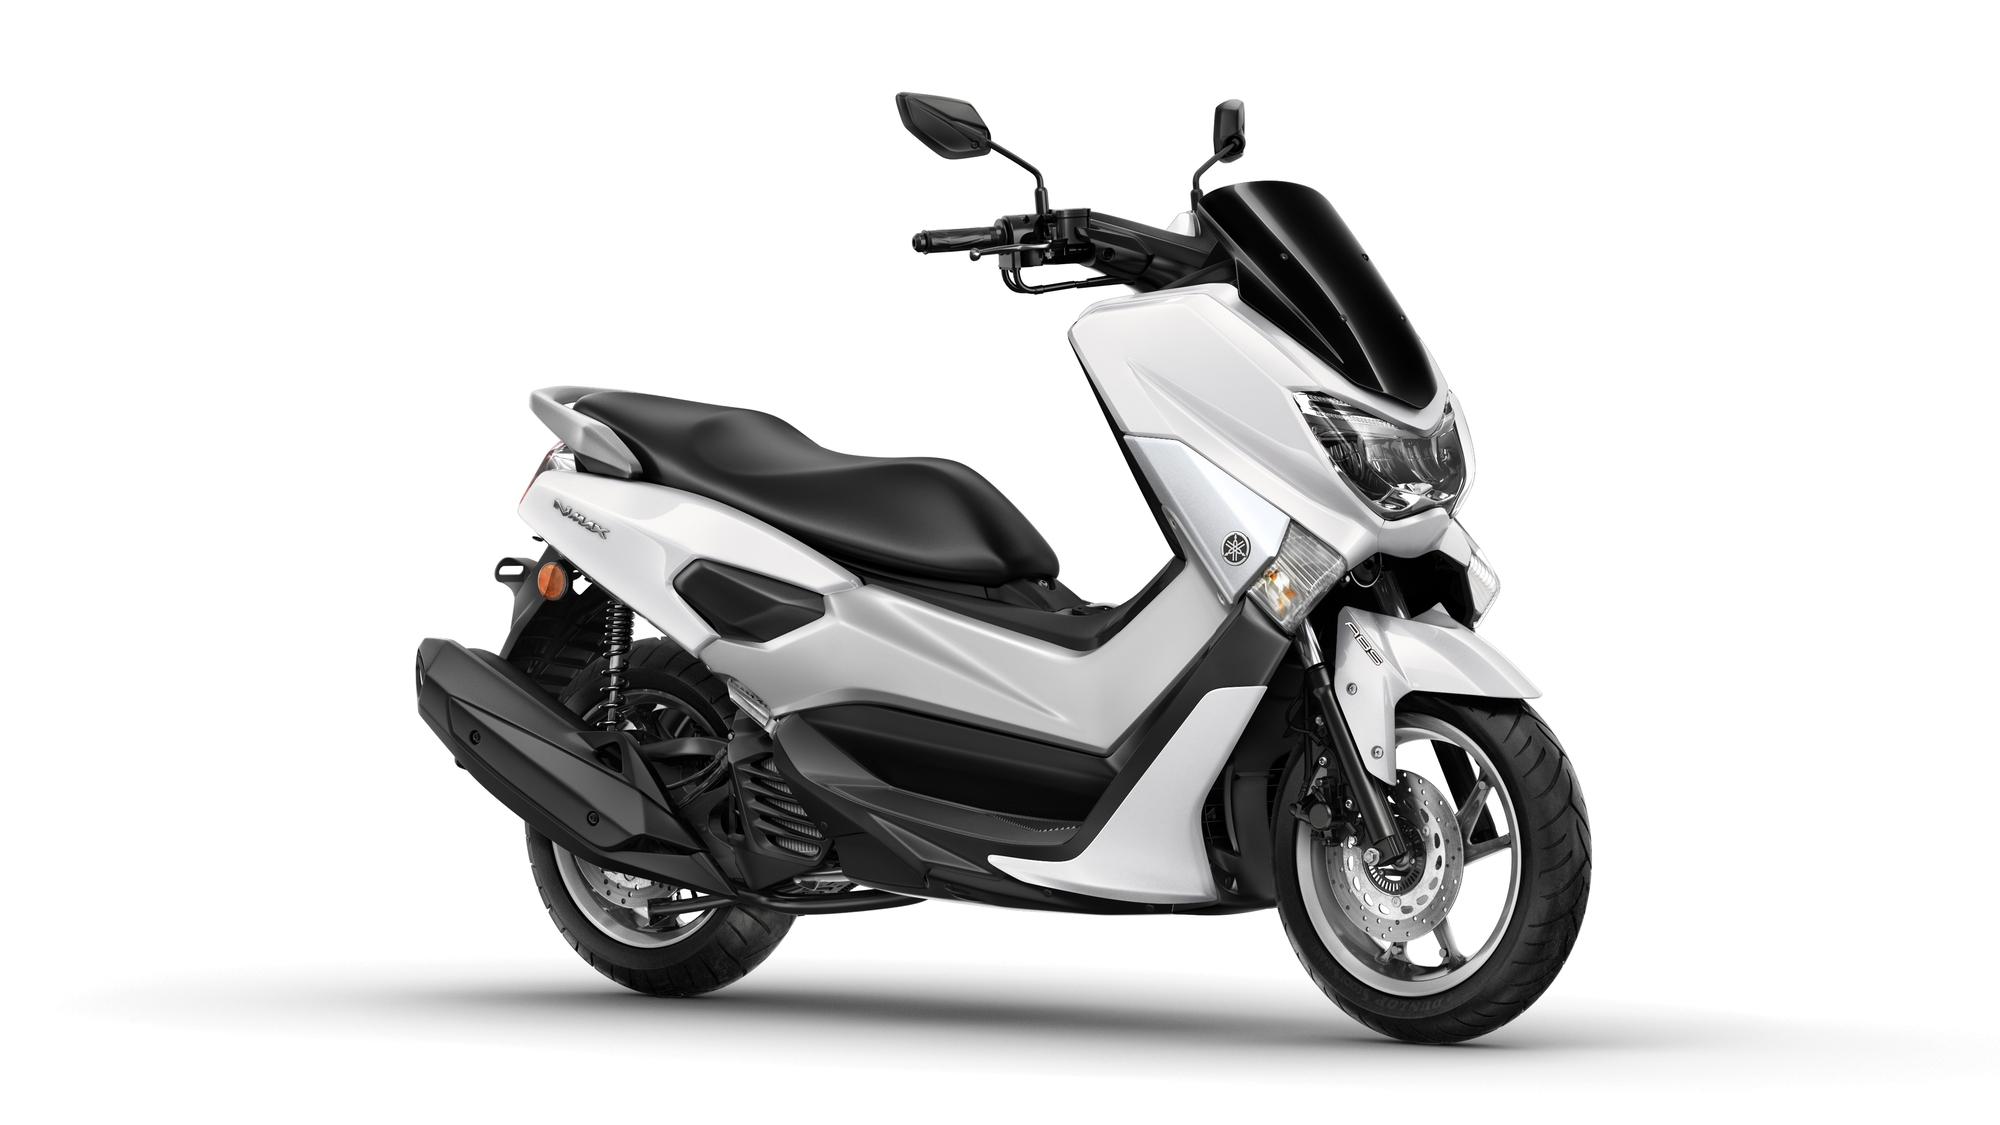 2015 Yamaha G125YM EU Milky White Studio 001 - Yamaha NMAX